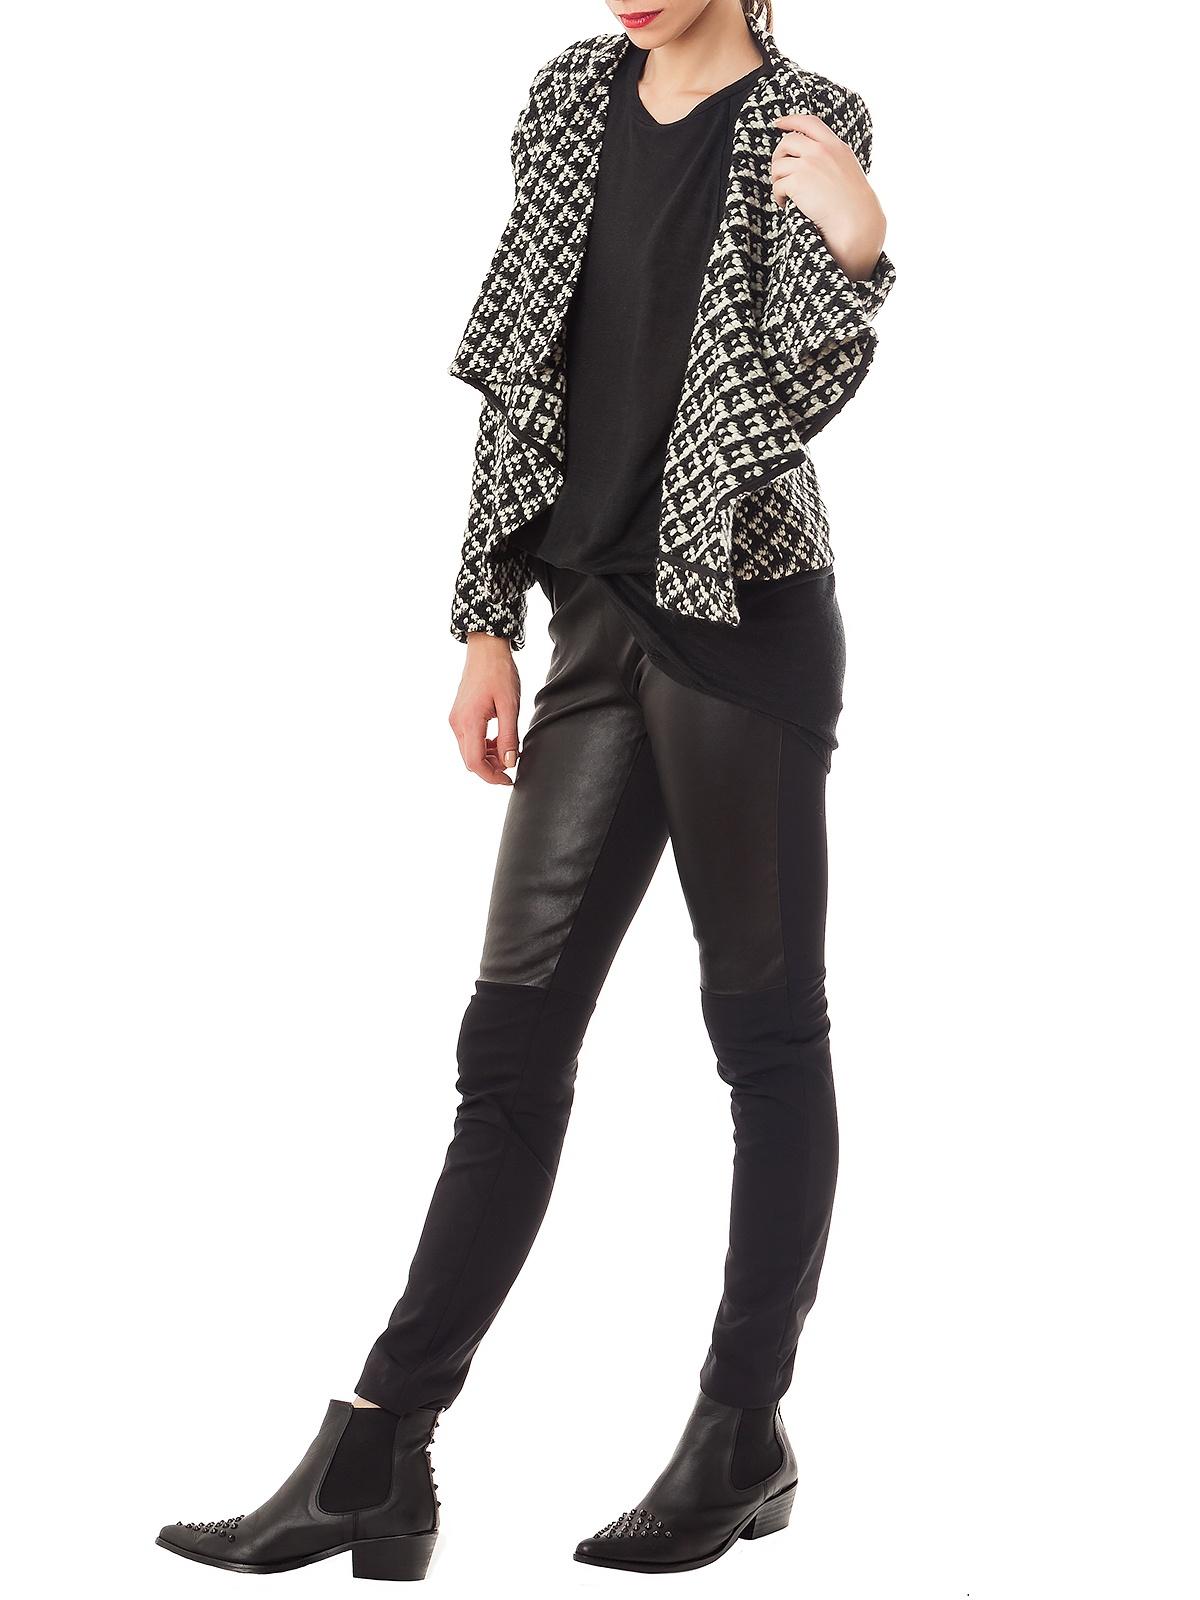 ILARIO TWEED JACKET | GIRISSIMA.COM - Collectible fashion to love and to last